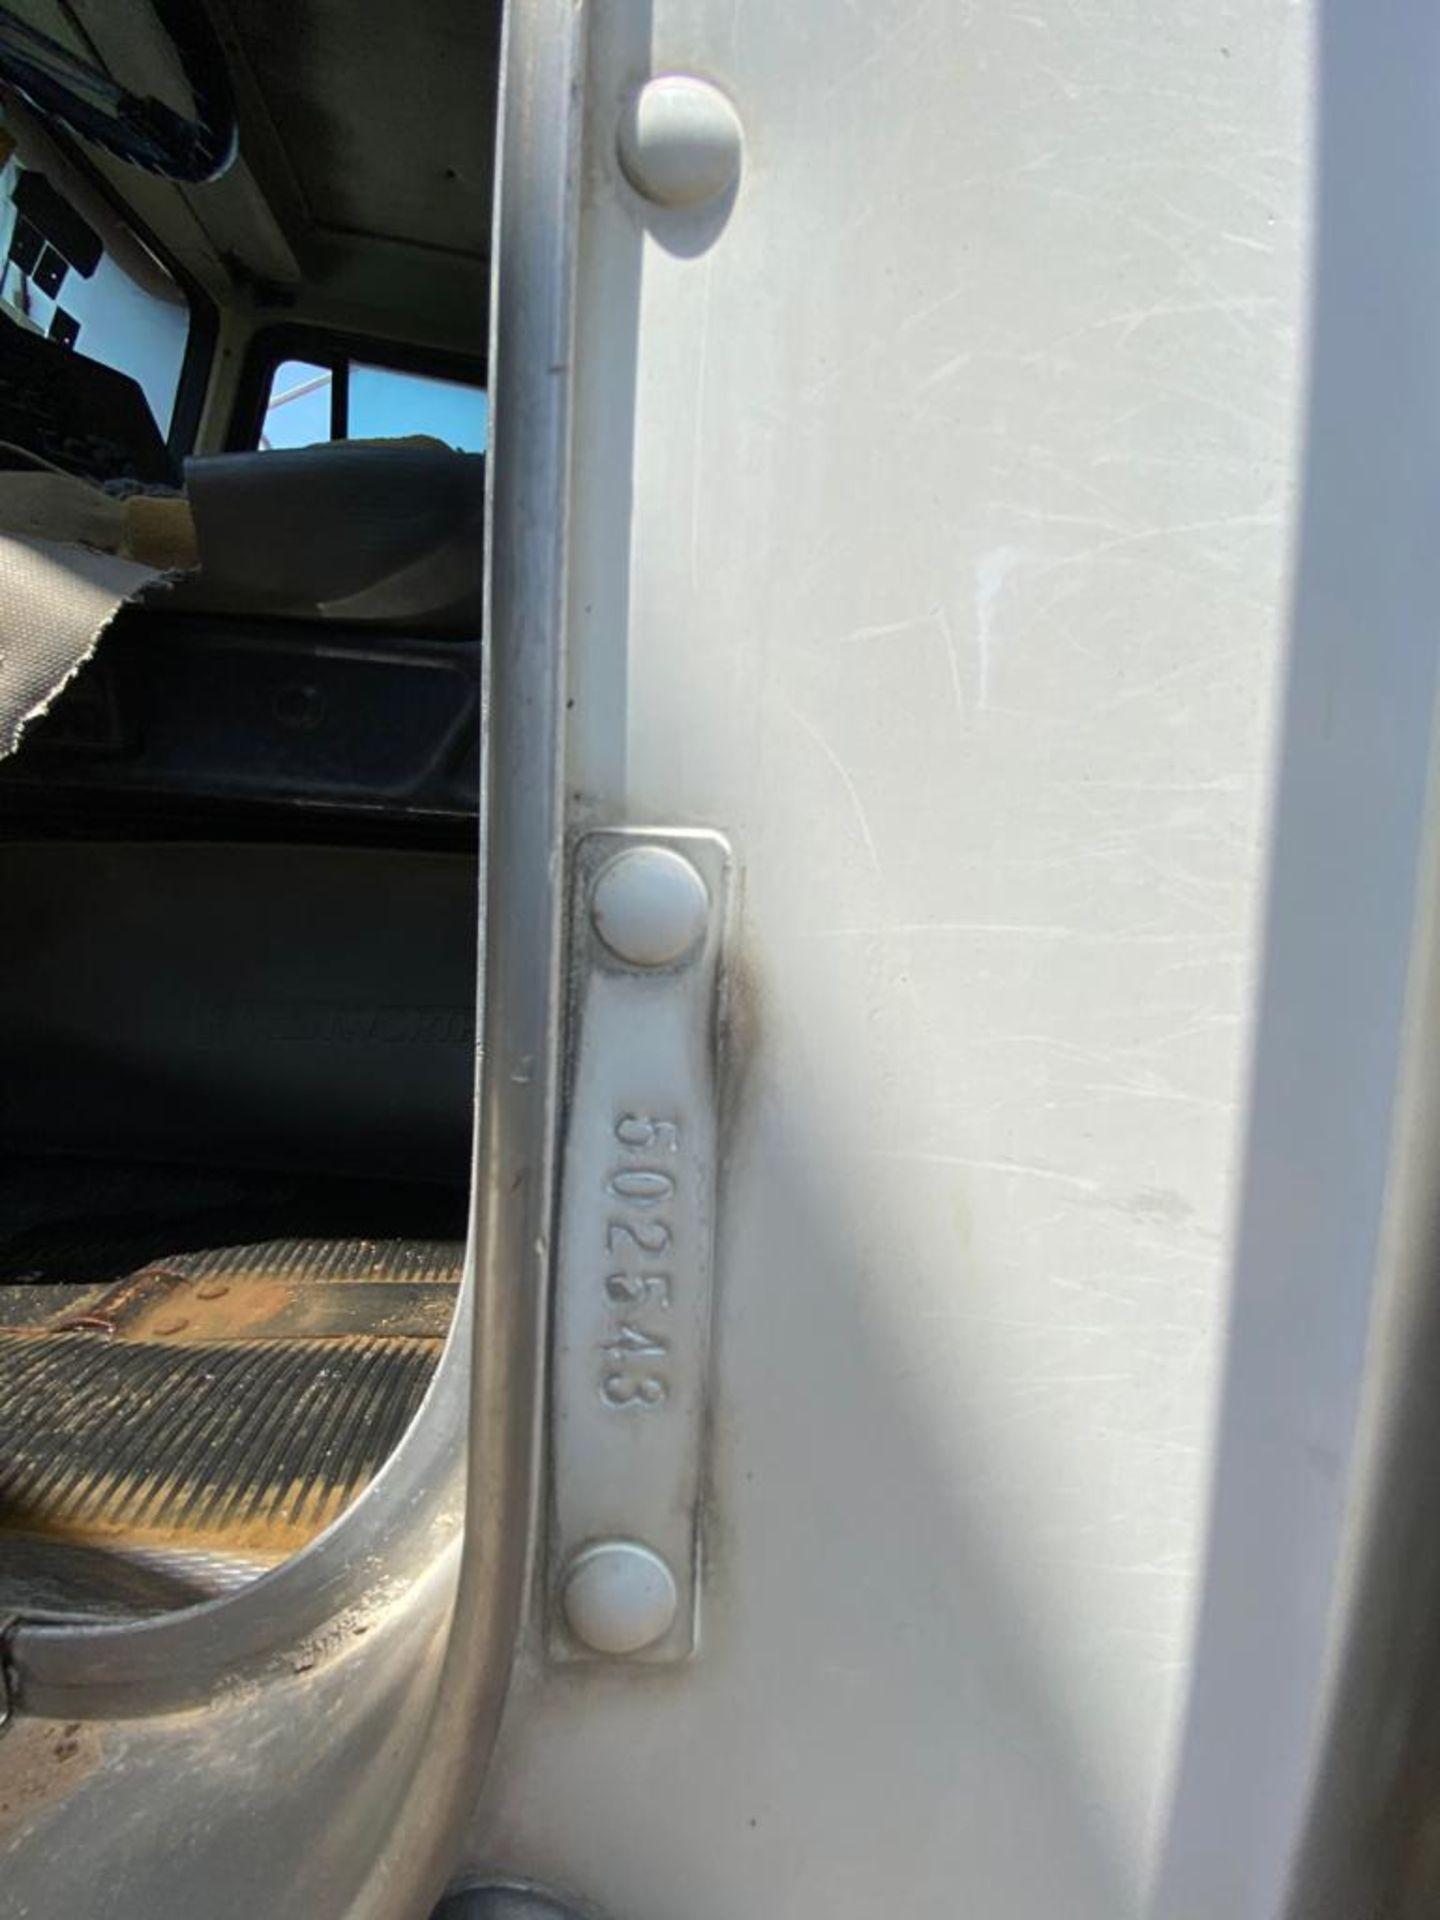 1998 Kenworth 5000 Gallon, standard transmission of 16 speeds - Image 42 of 68